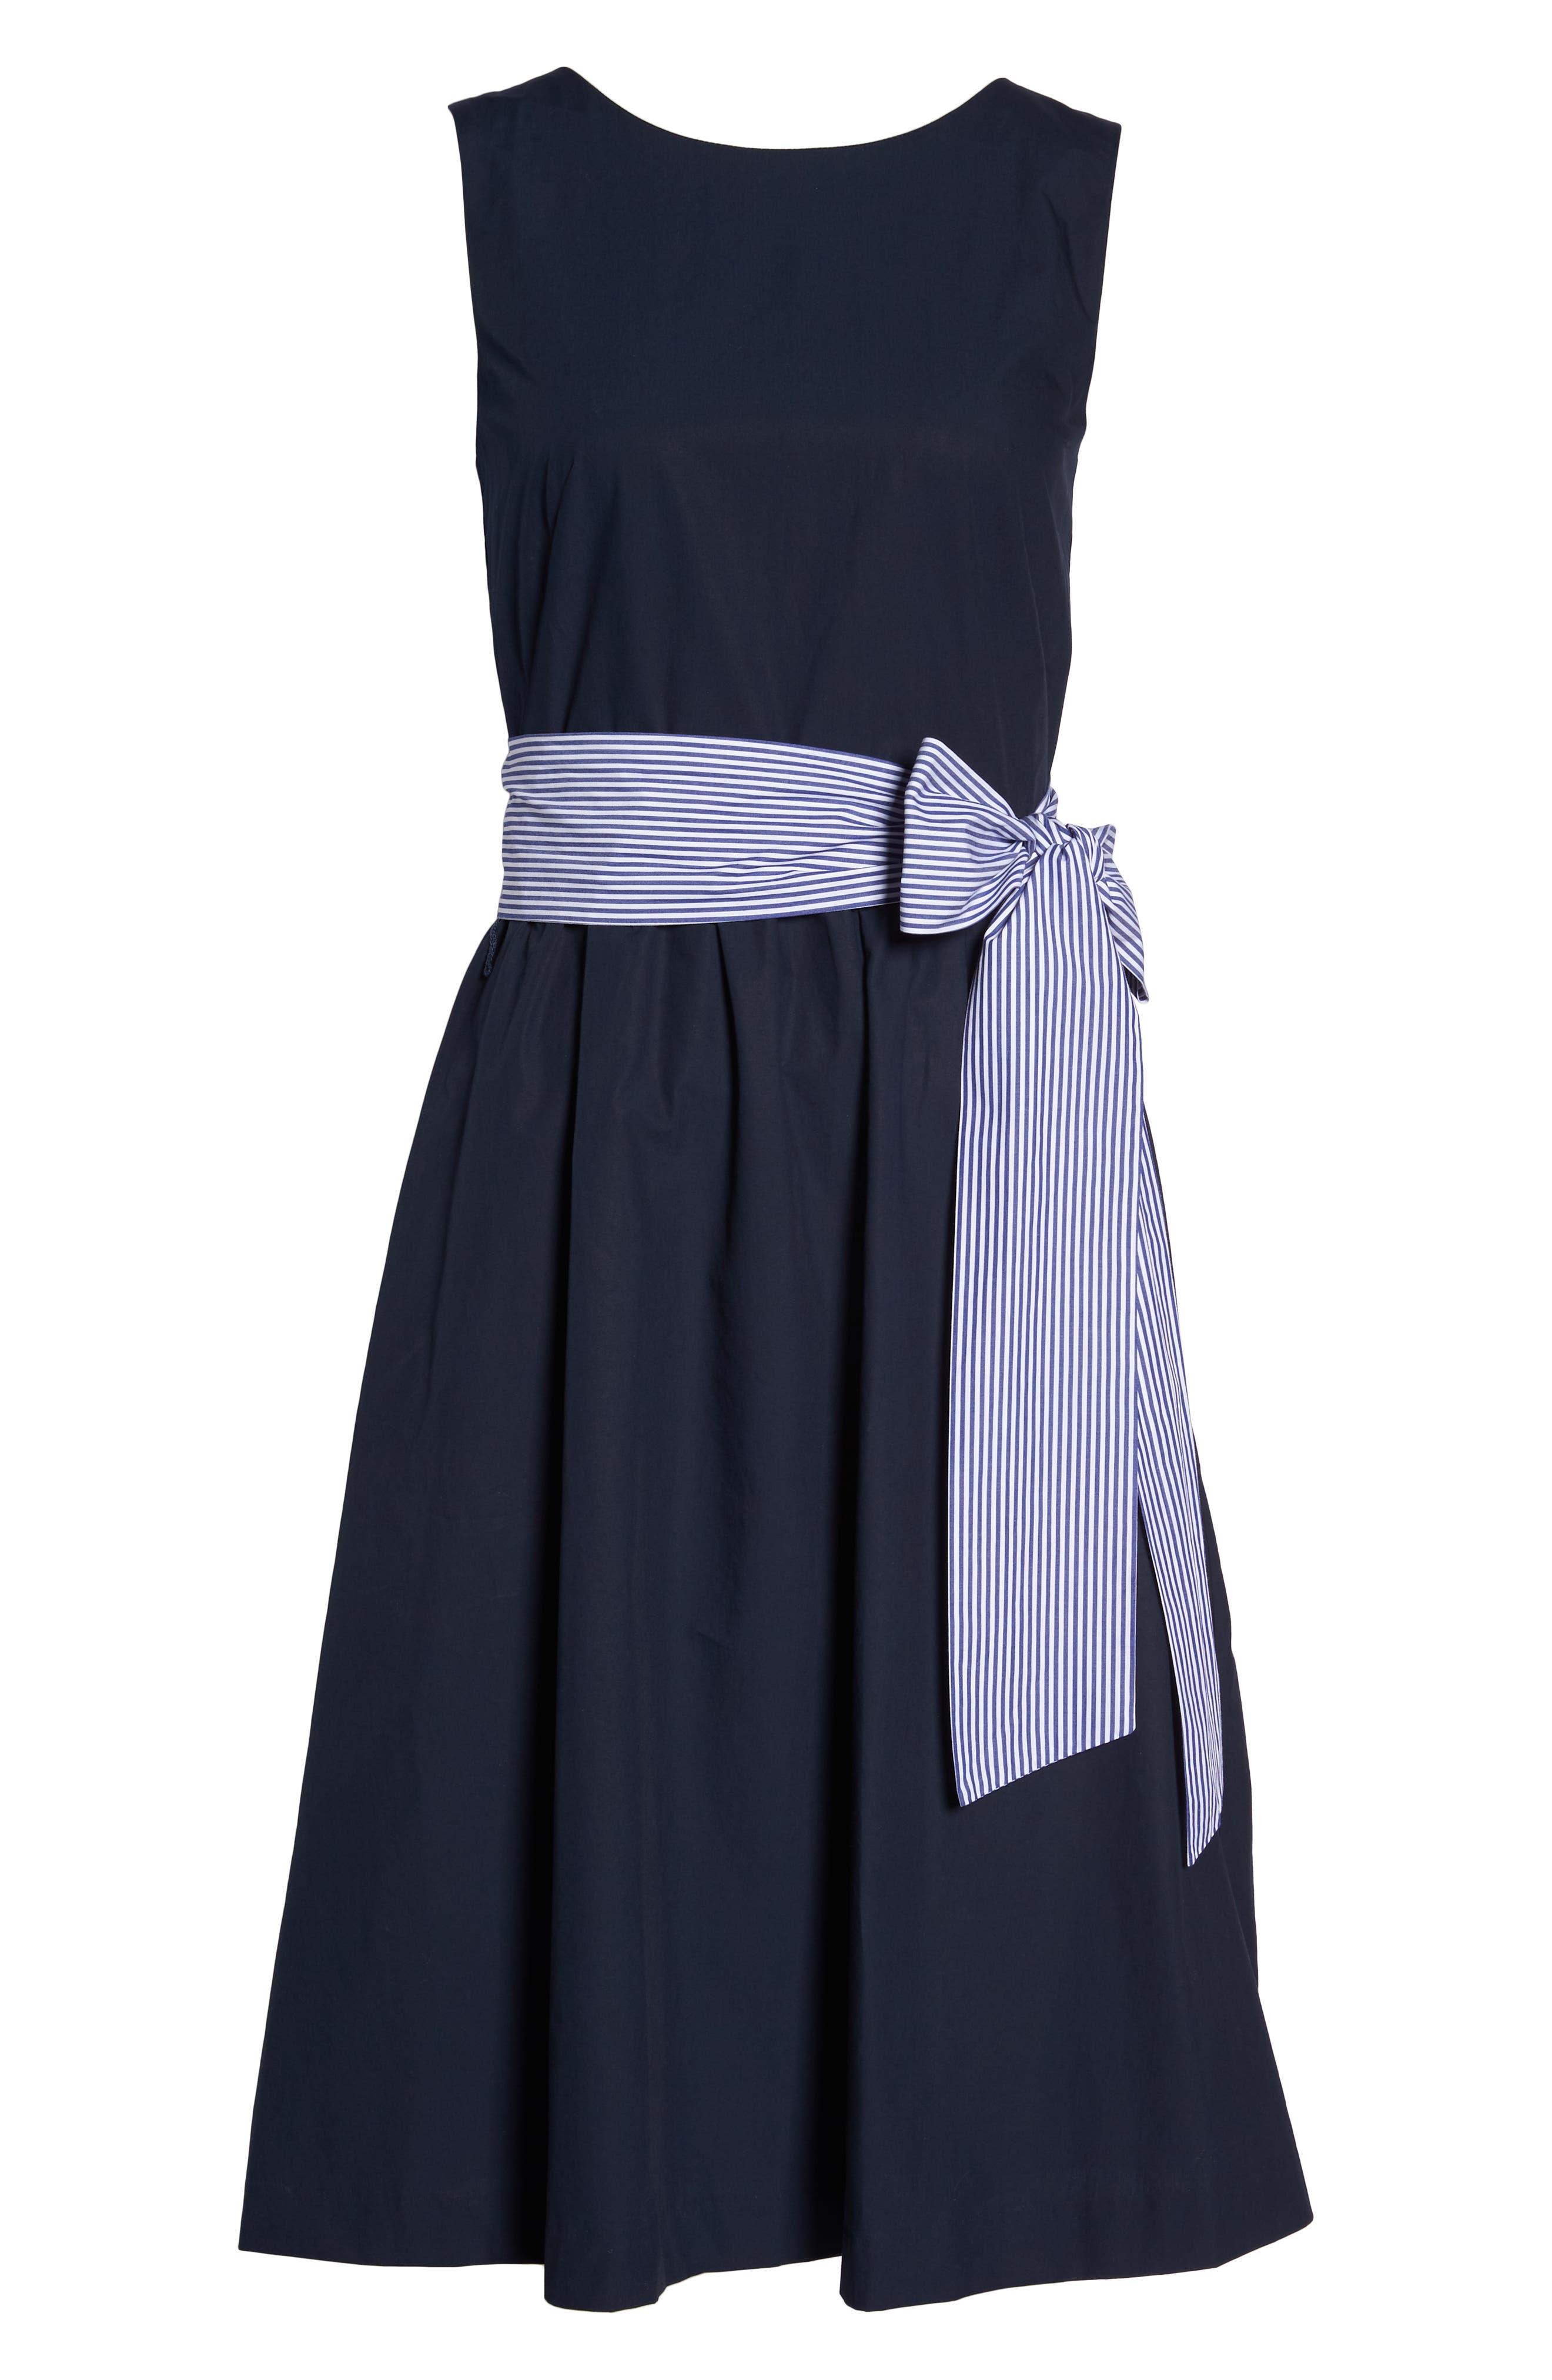 Two-Tone Tie Waist Sheath Dress,                             Alternate thumbnail 7, color,                             401